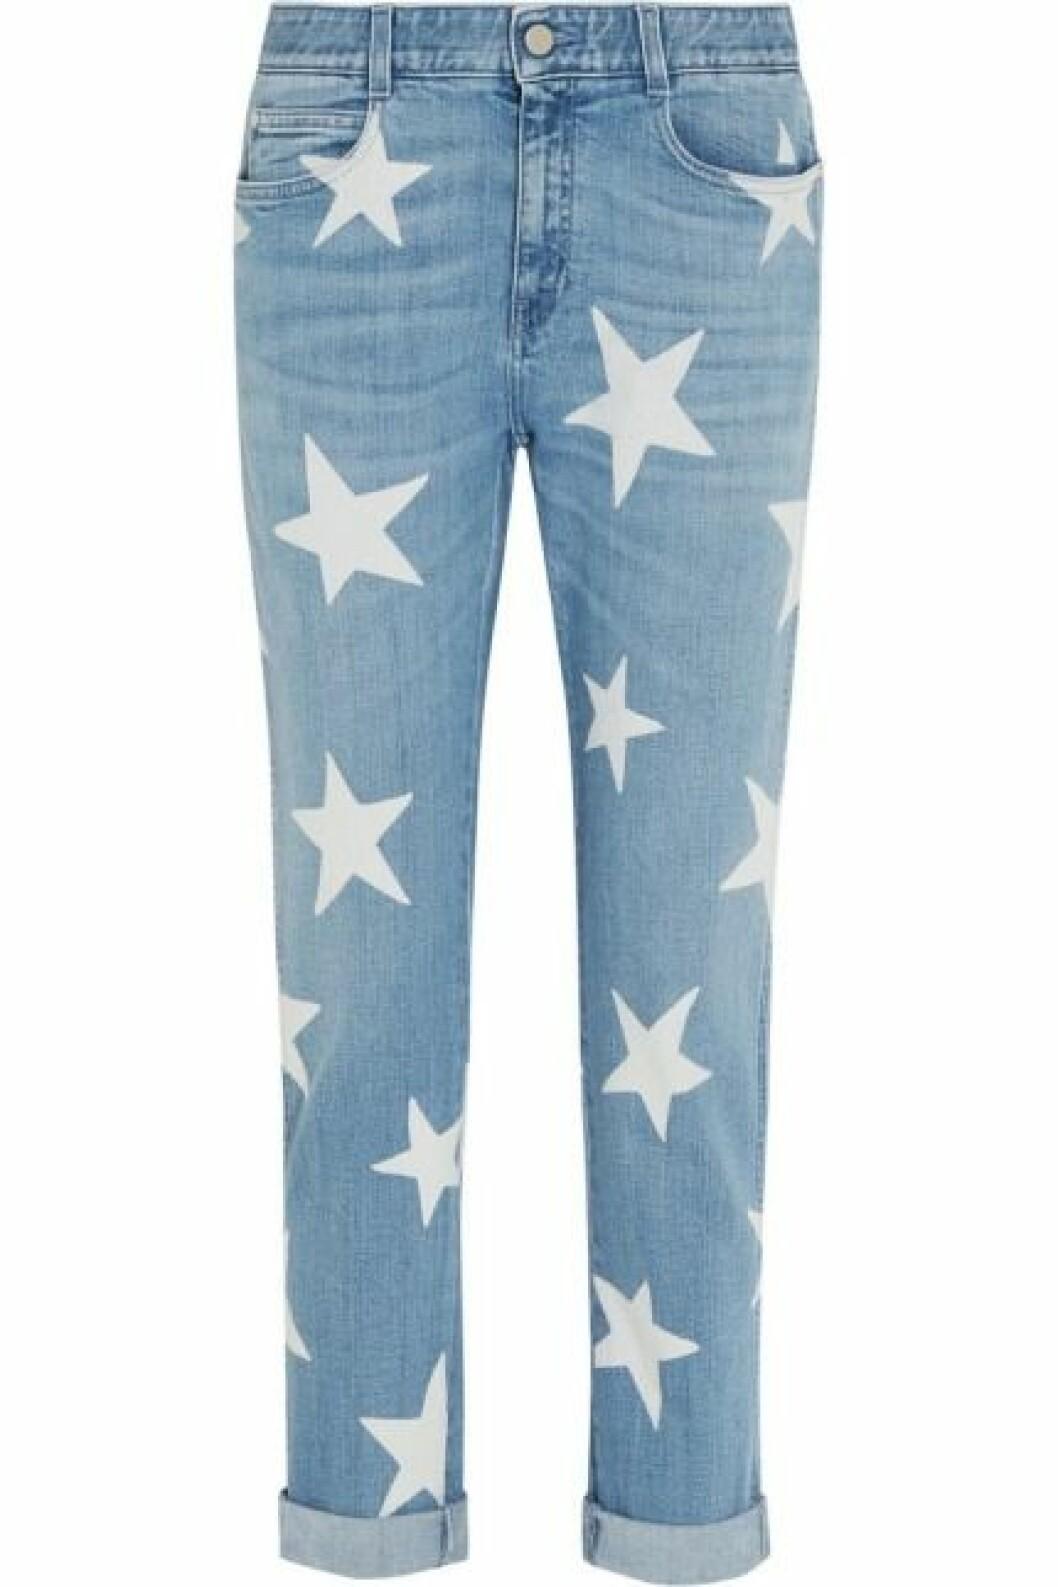 jeans stjärnor